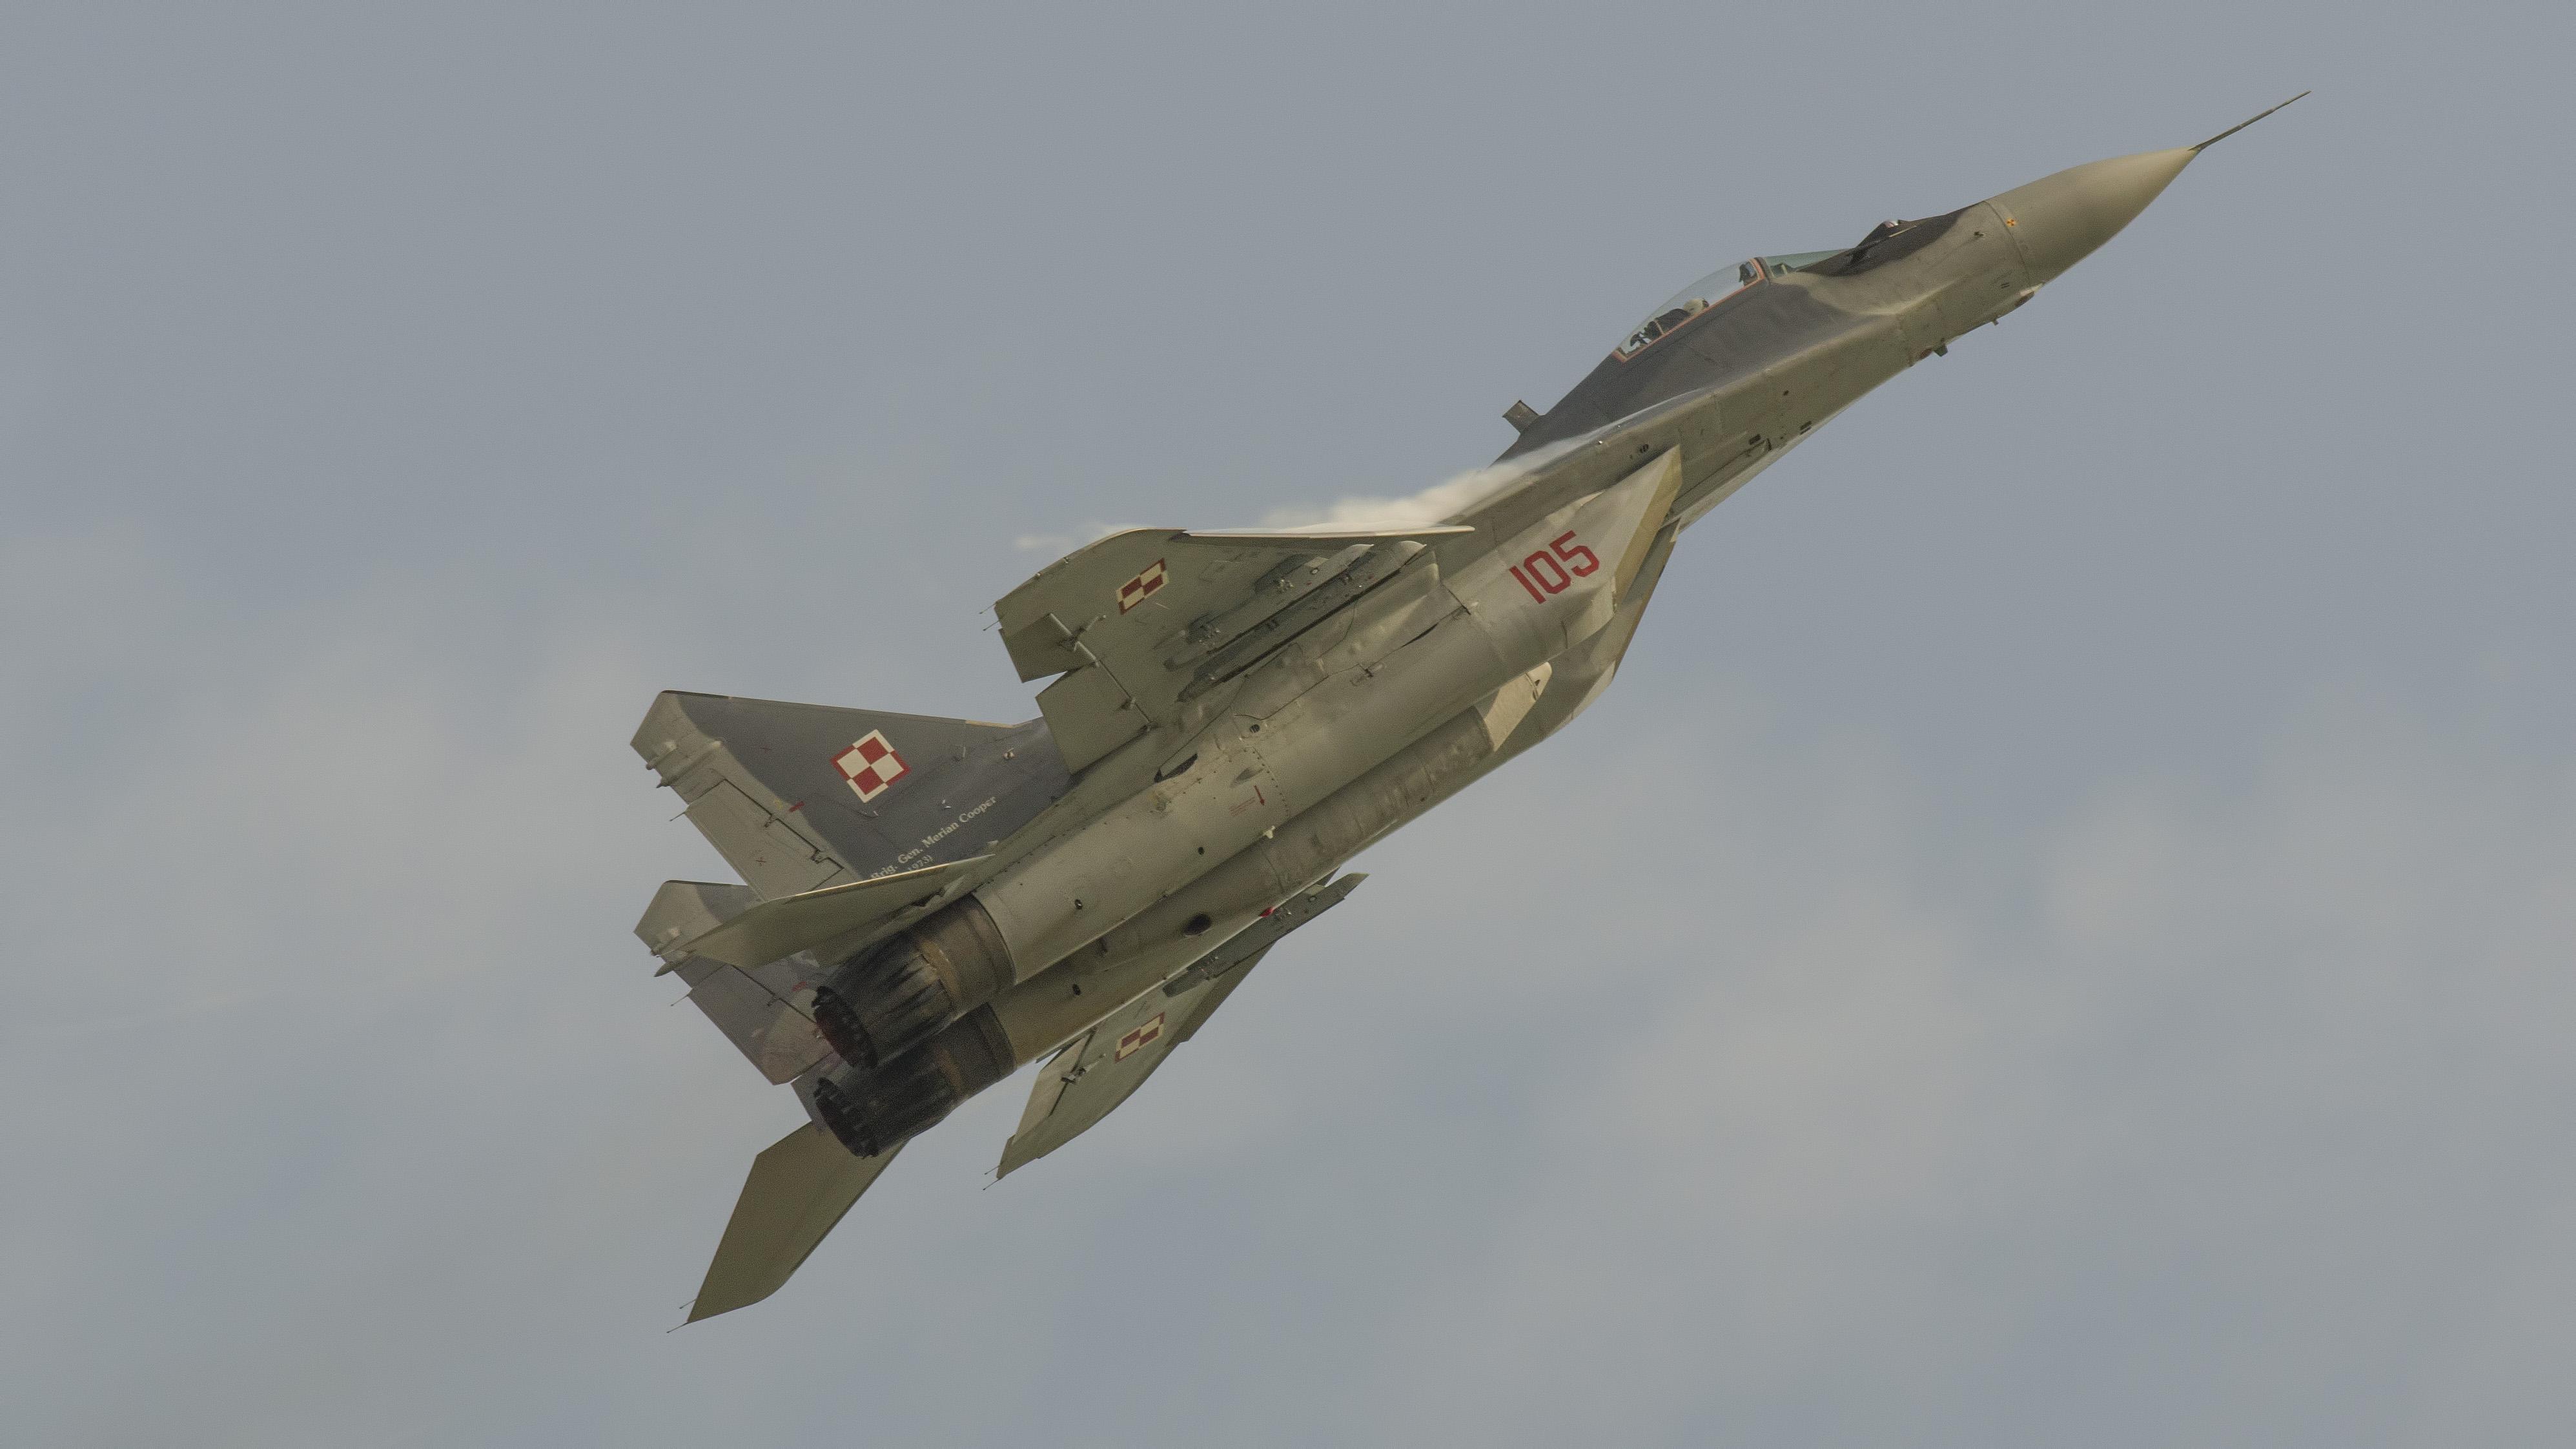 _IMG2069 Mikoyan-Gurevich MiG-29A 9-12A 105 Polish Air Force